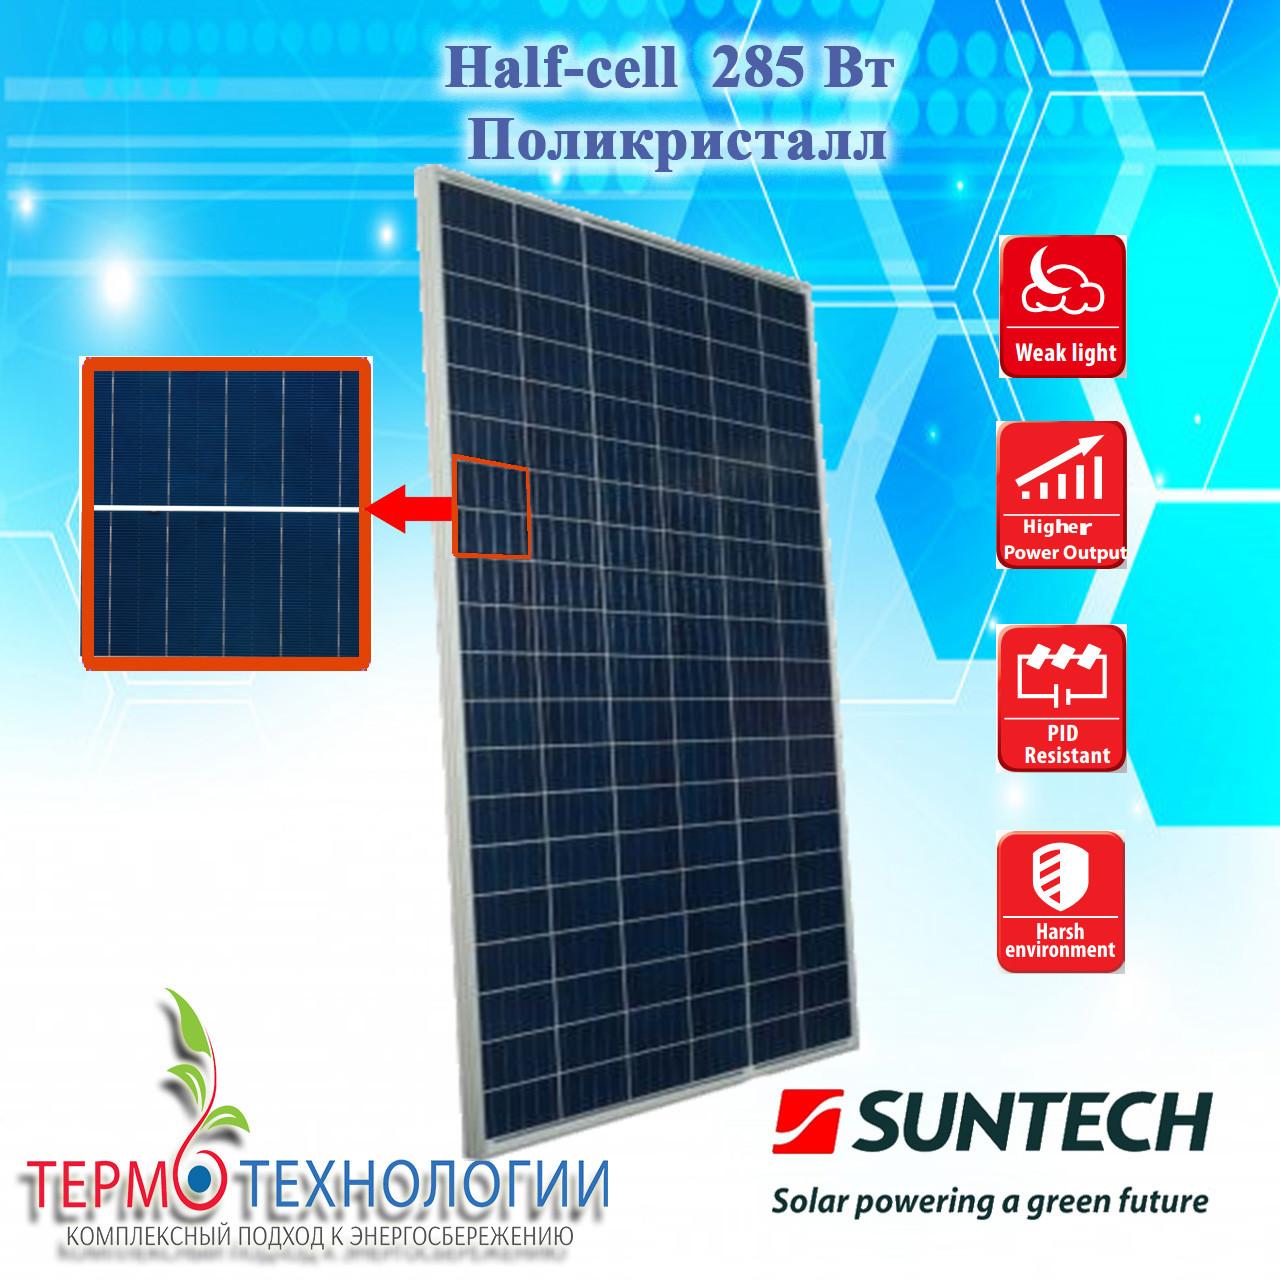 Солнечная батарея SunTech 285 Вт, Half-cell